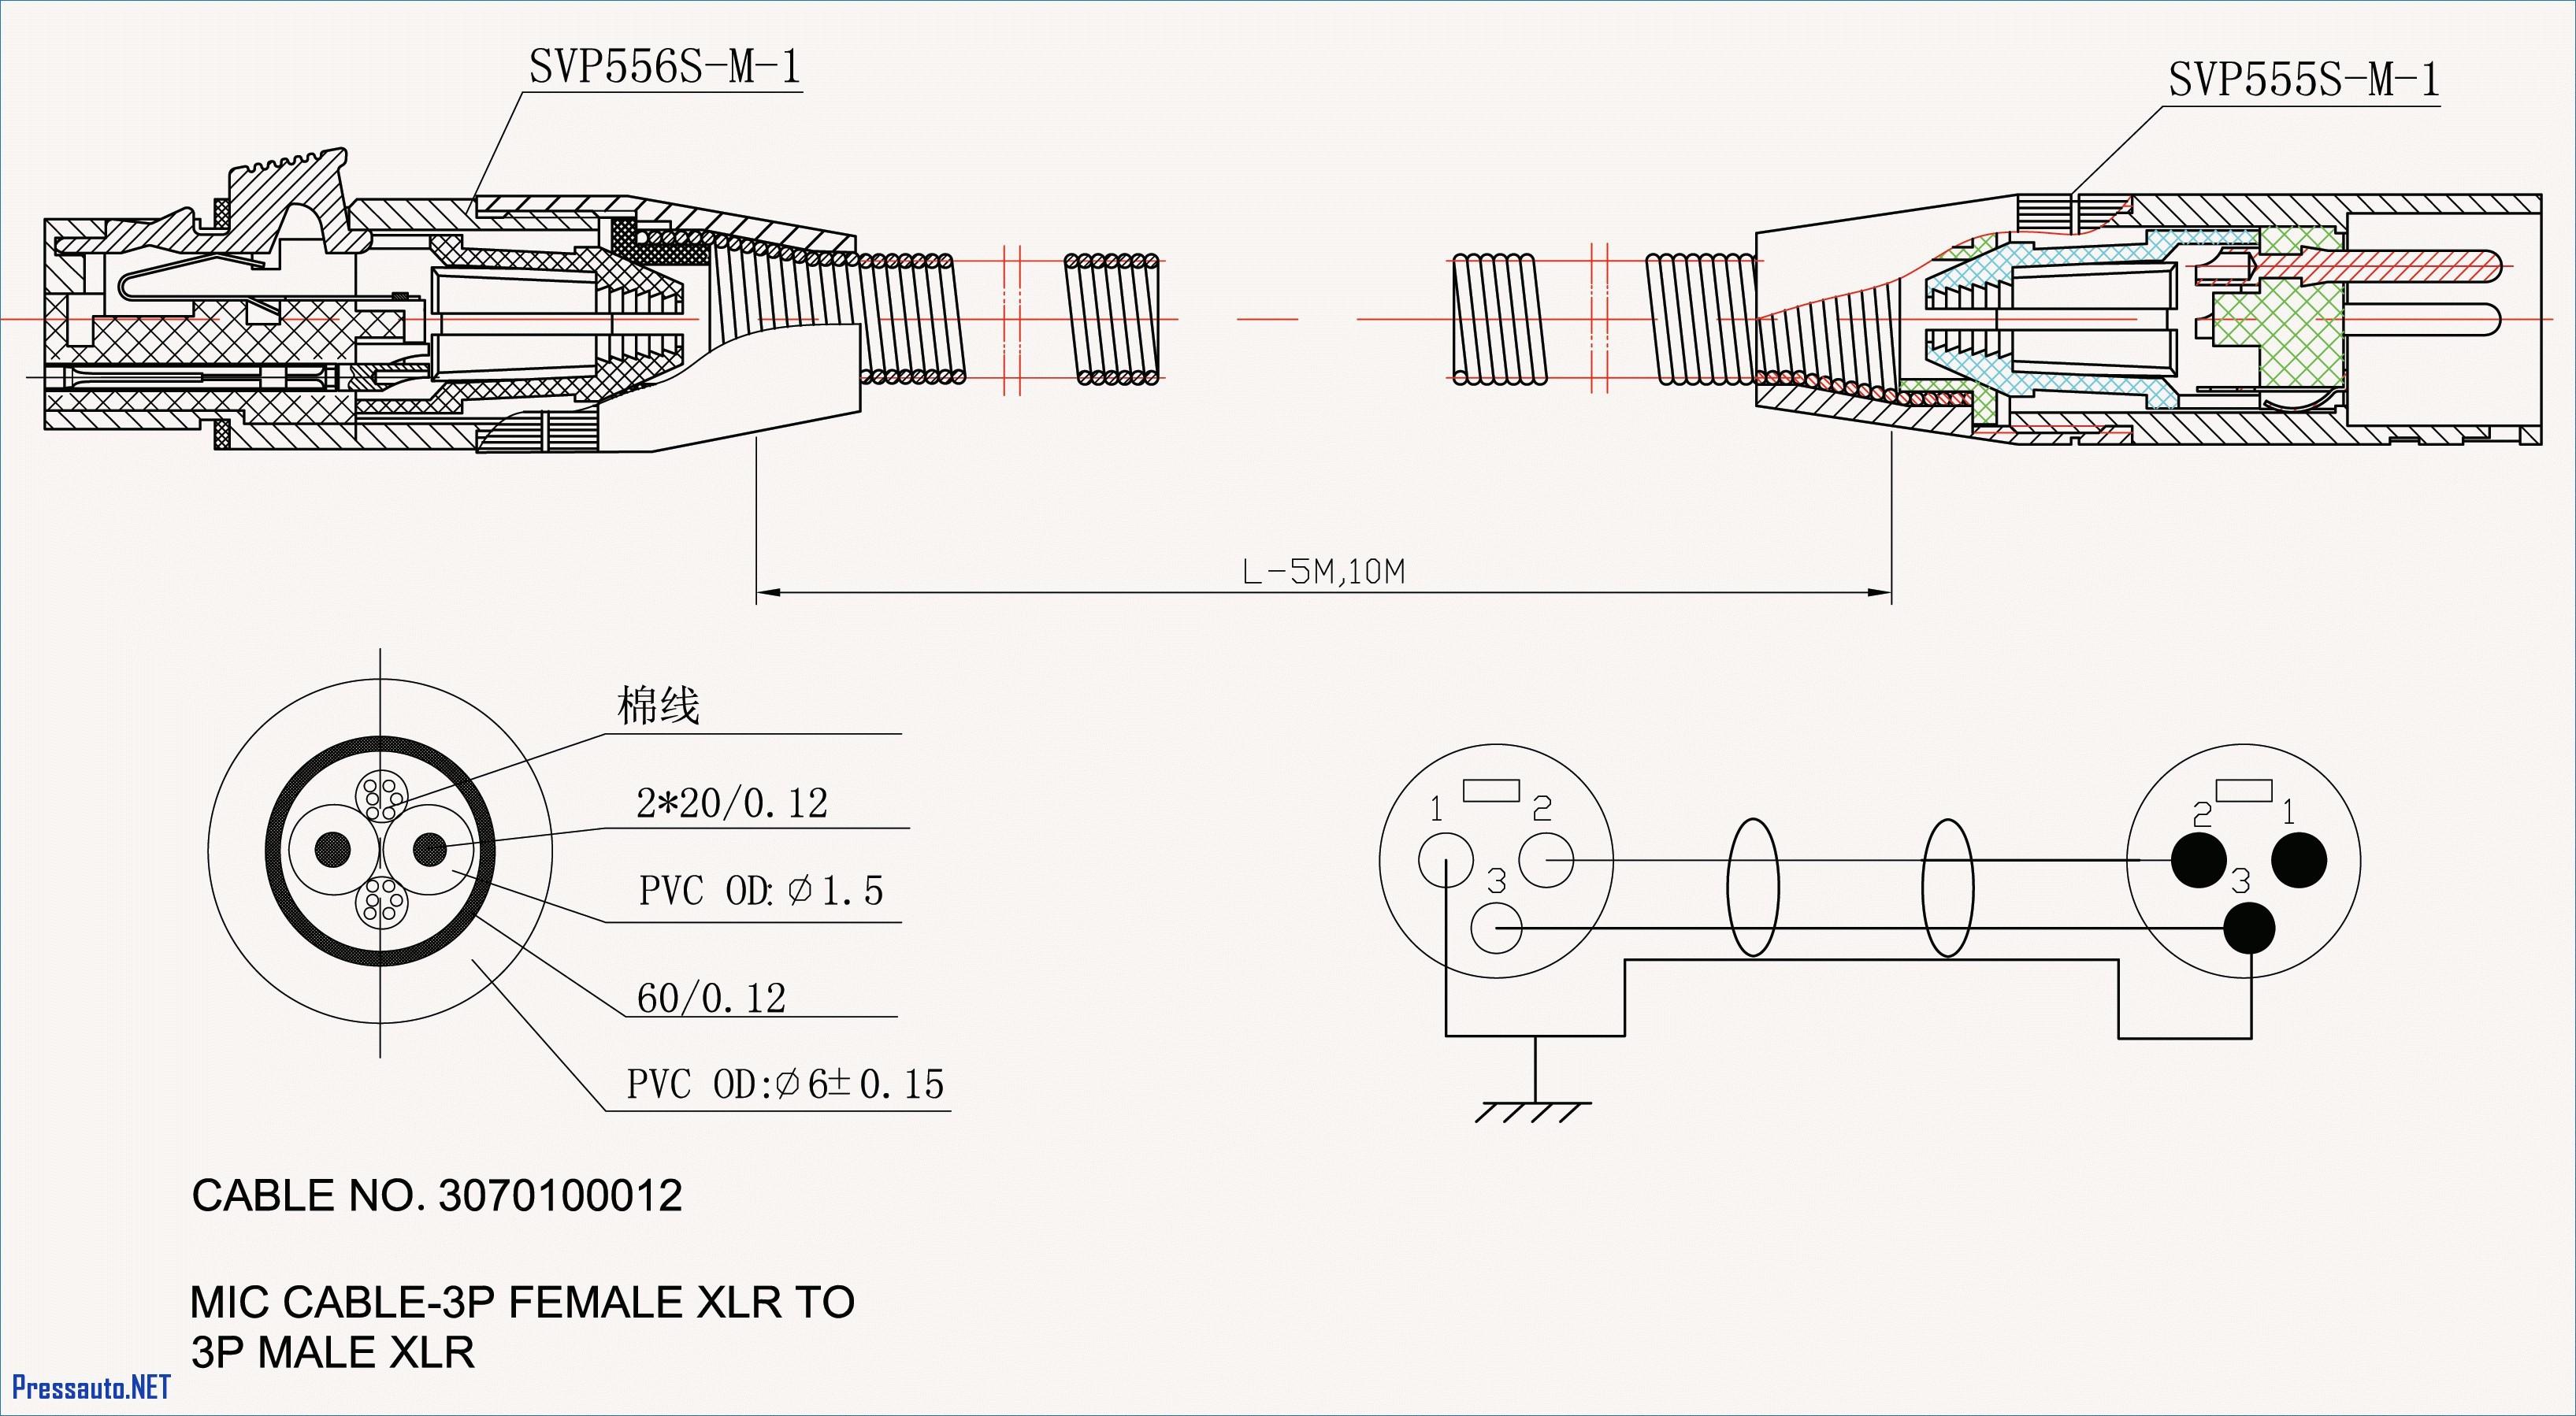 Massey Ferguson 35 Diesel Wiring Diagram 2018 Massey Ferguson 135 Wiring Diagram With Alternator Save Xlr – Wiring